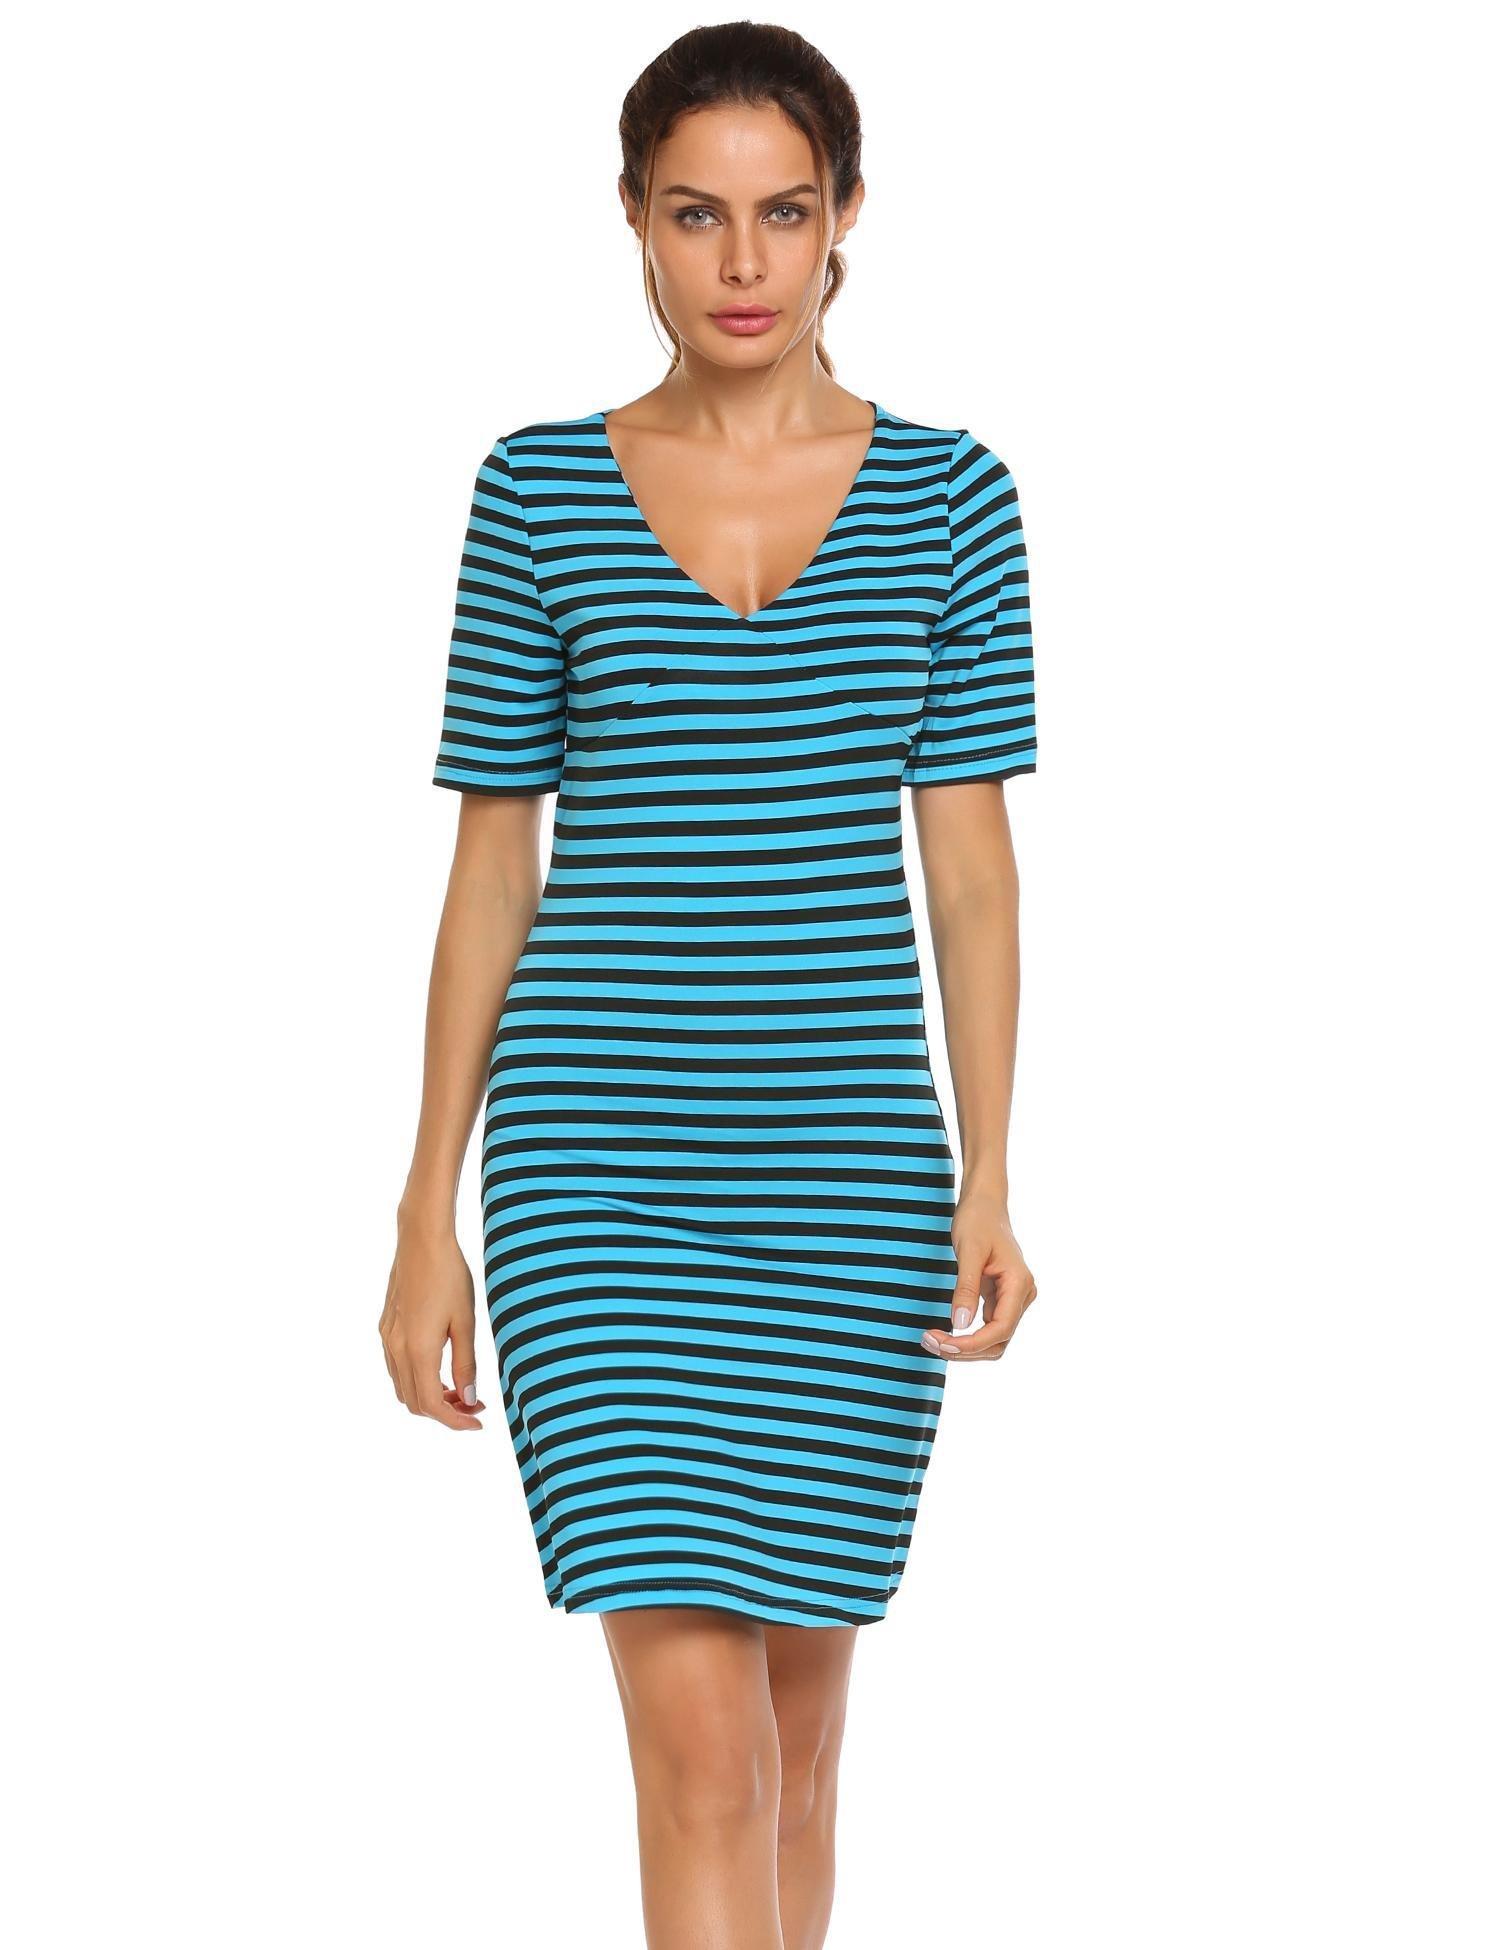 ACEVOG Damen Sommer kleid Casual V-Ausschnitt Kurzarm Streifen Shirt Jerseykleid Minikleid